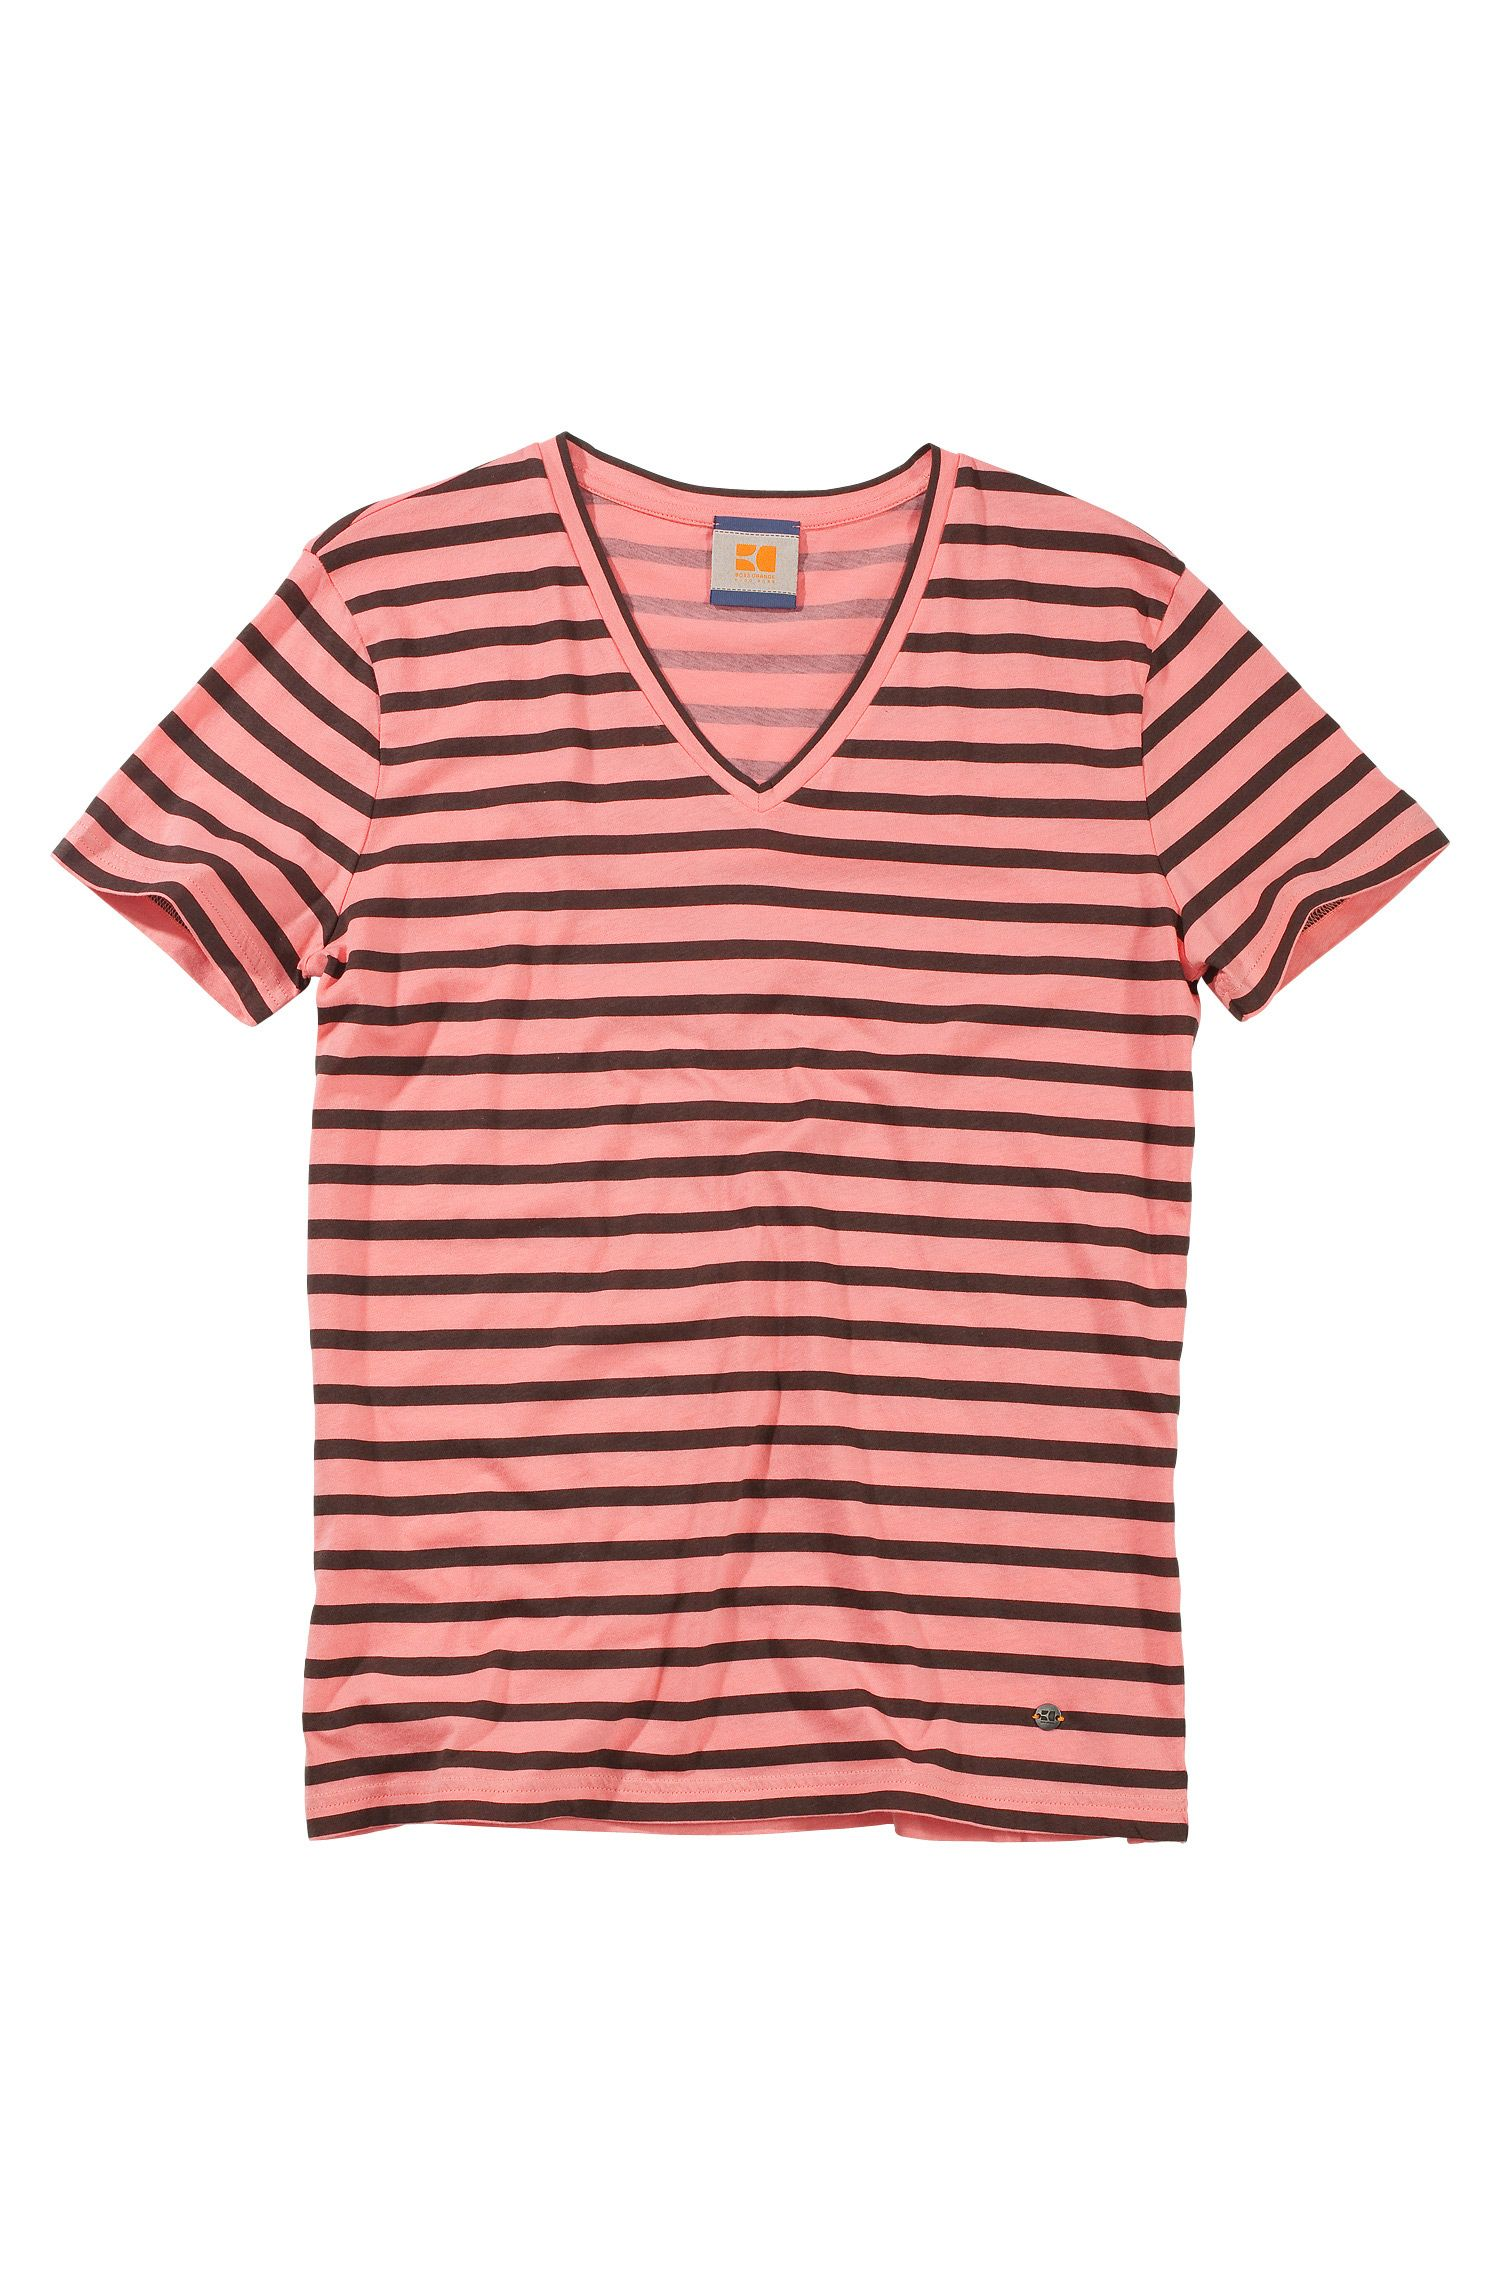 Baumwoll-Shirt ´Toast` mit V-Ausschnitt